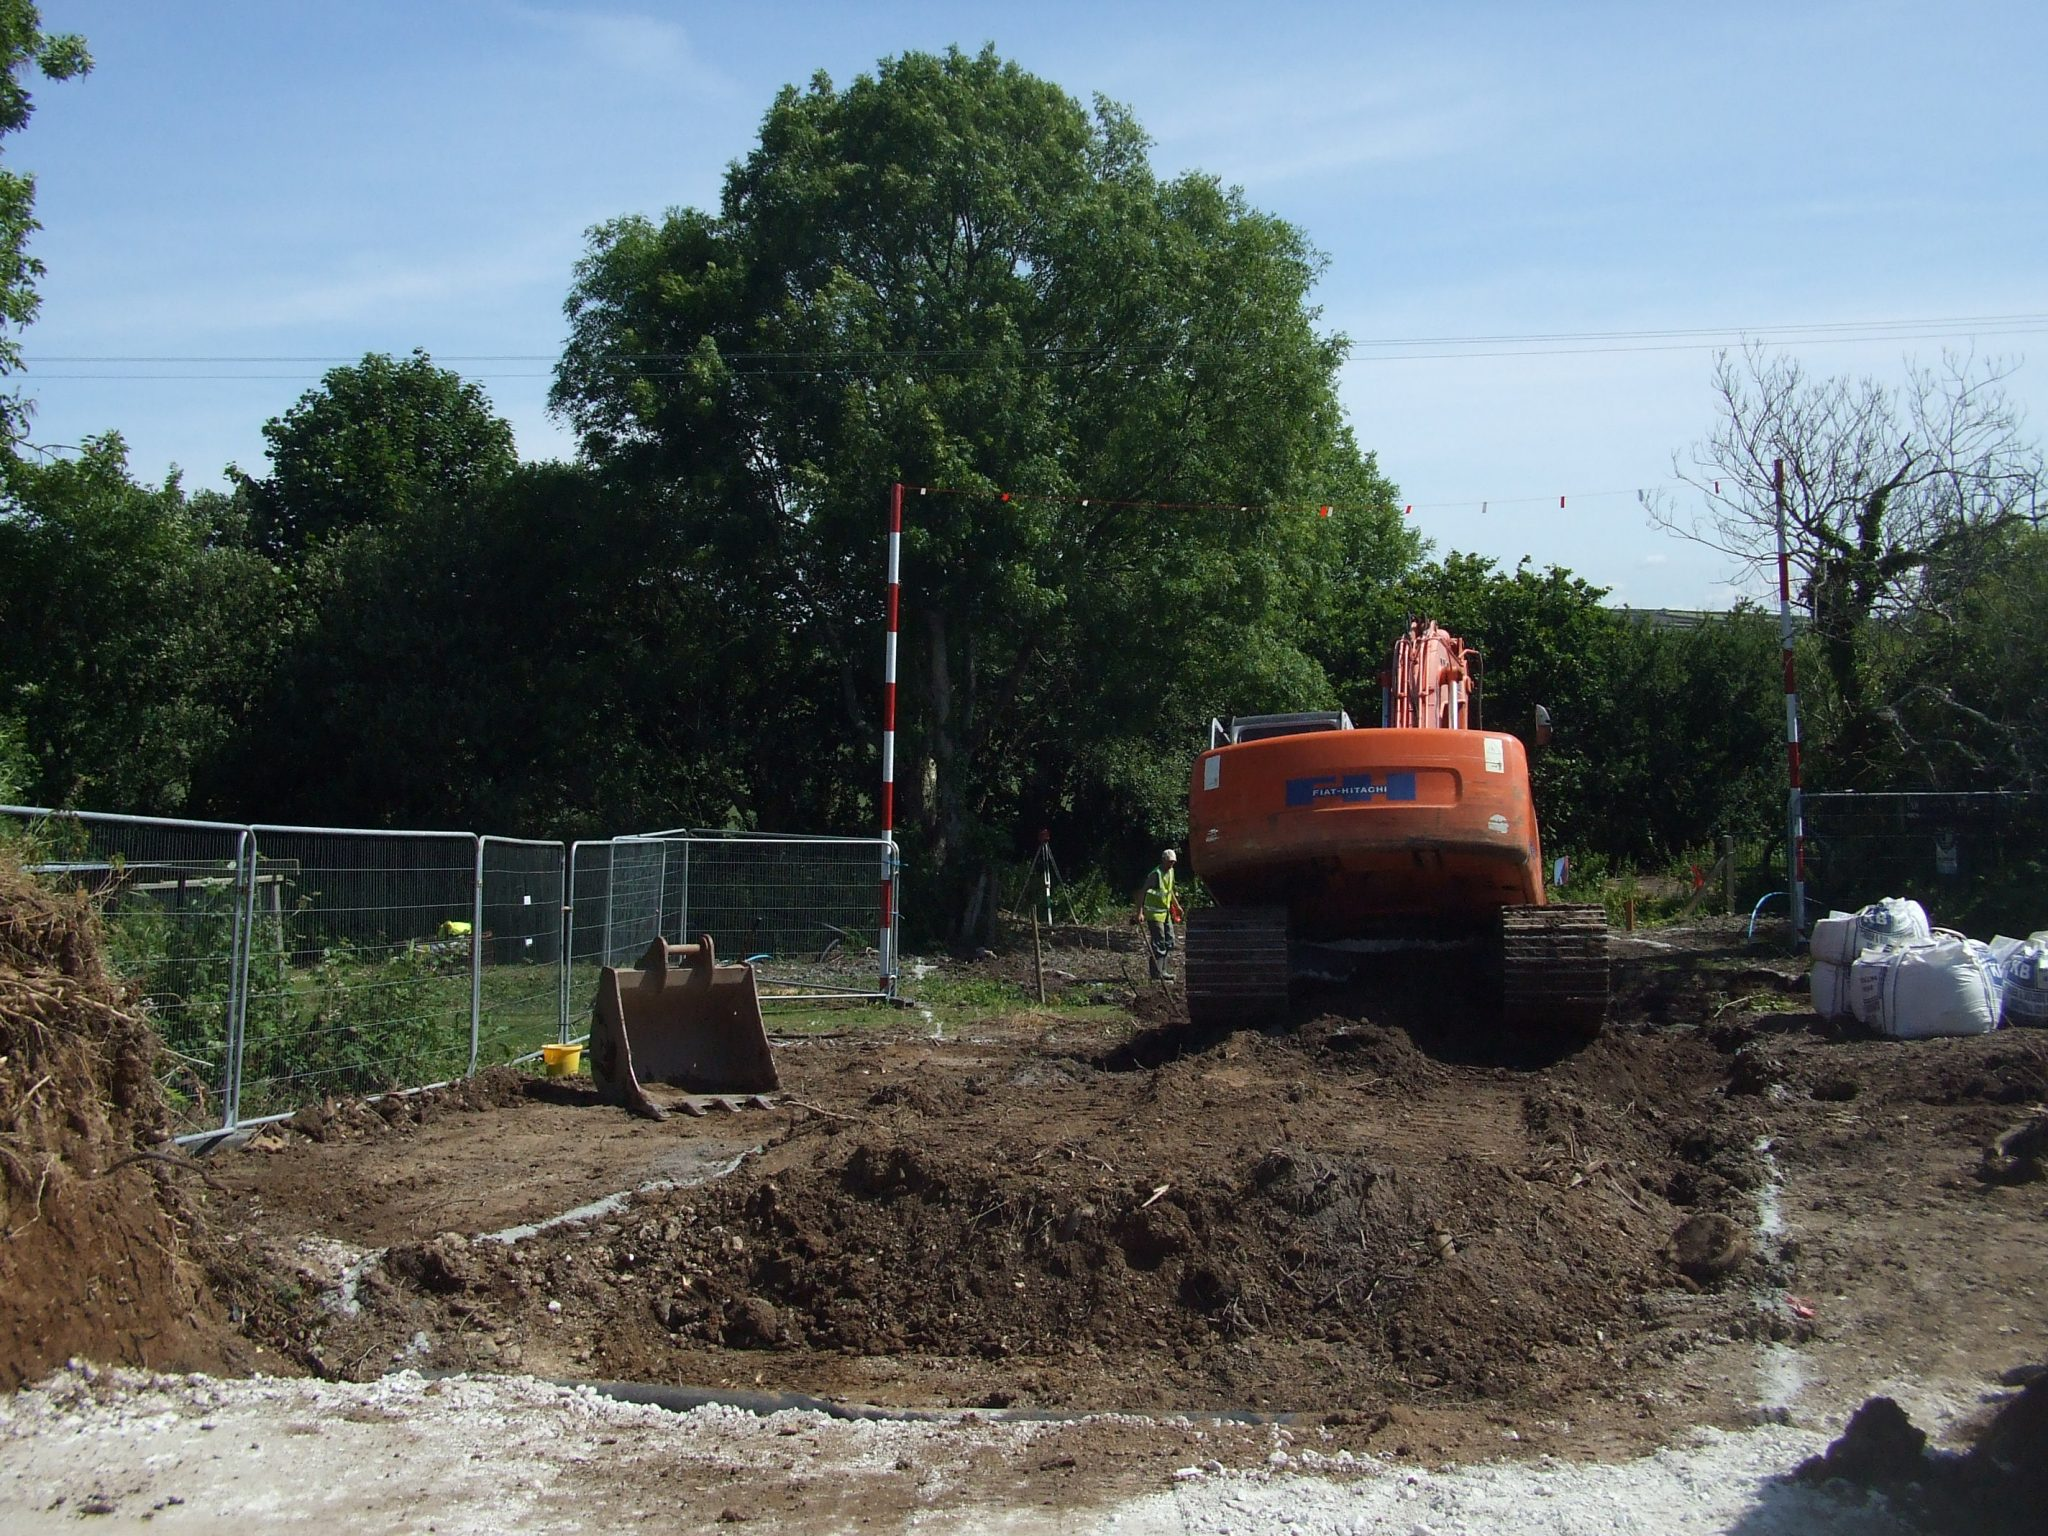 Excavation of site